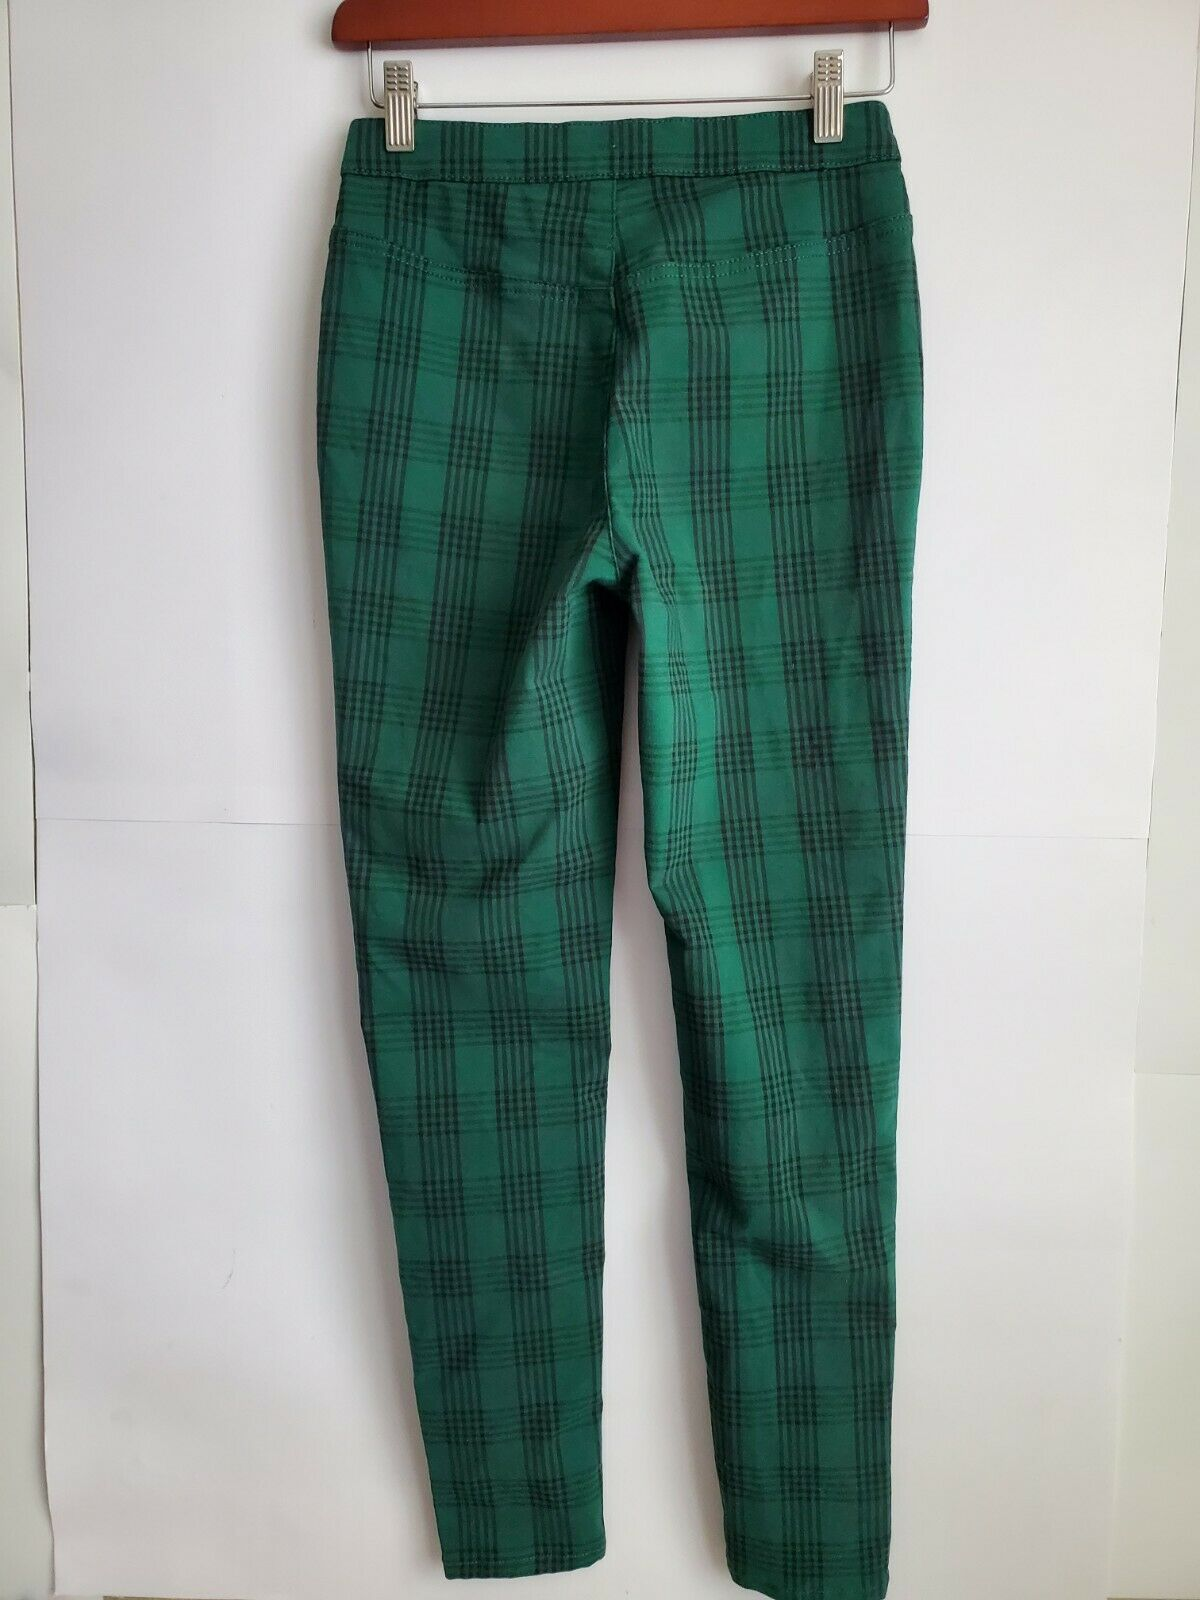 Free People  Women's Green Plaid Skinny Pants, Si… - image 3